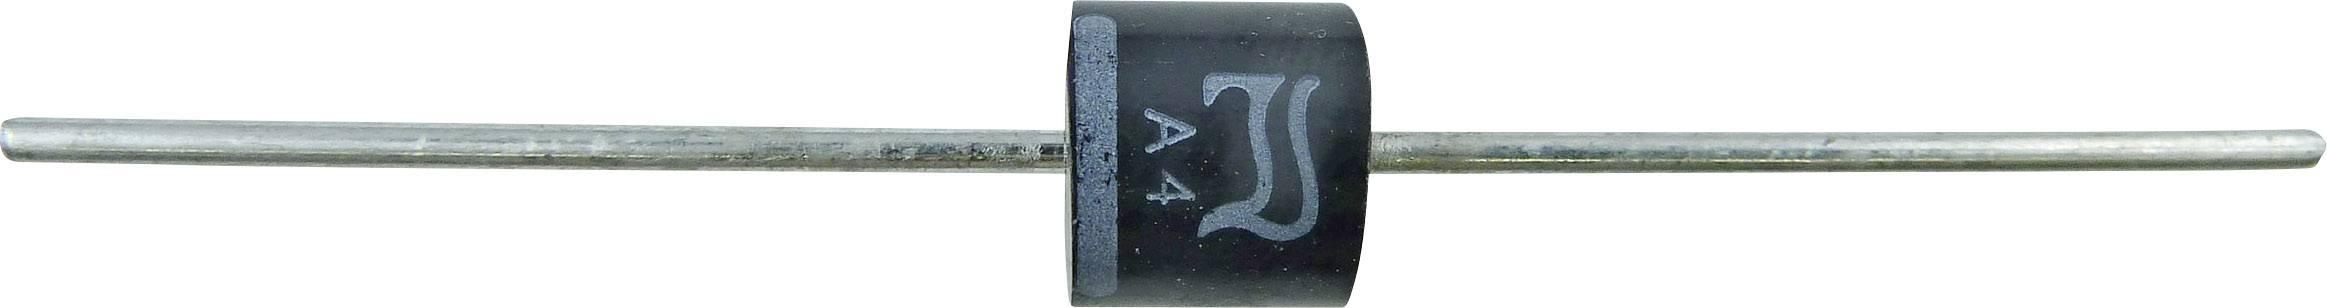 Kremíková usmerňovacia dióda TRU COMPONENTS TC-P600D 1581855 6 A, 200 V